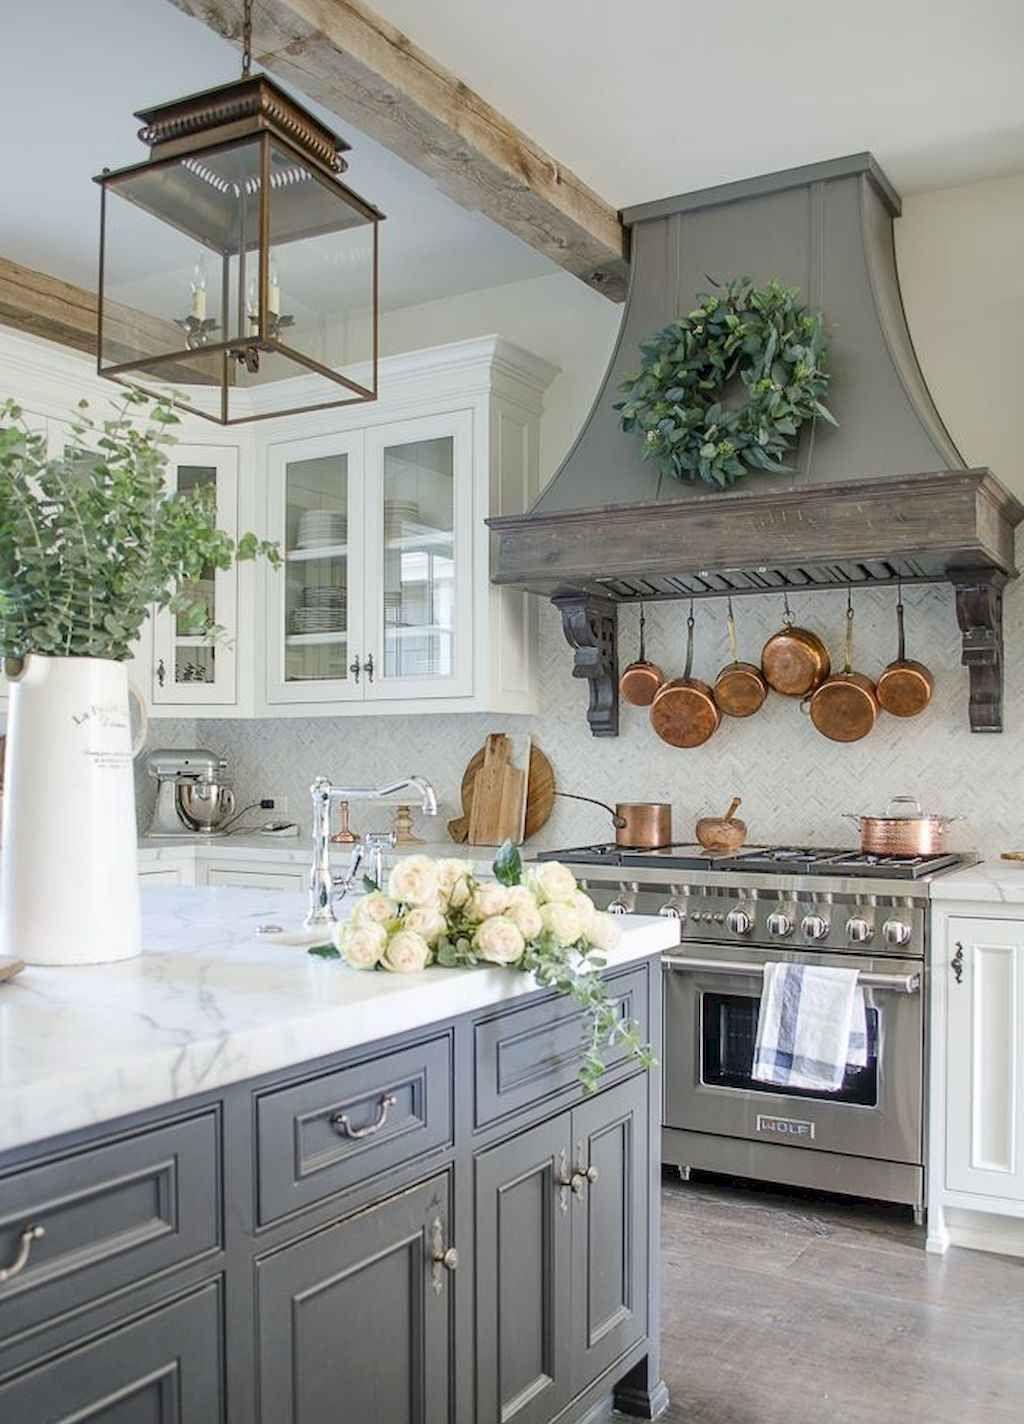 What Is This Plant Farmhouse Kitchen Design Country Kitchen Designs Kitchen Renovation